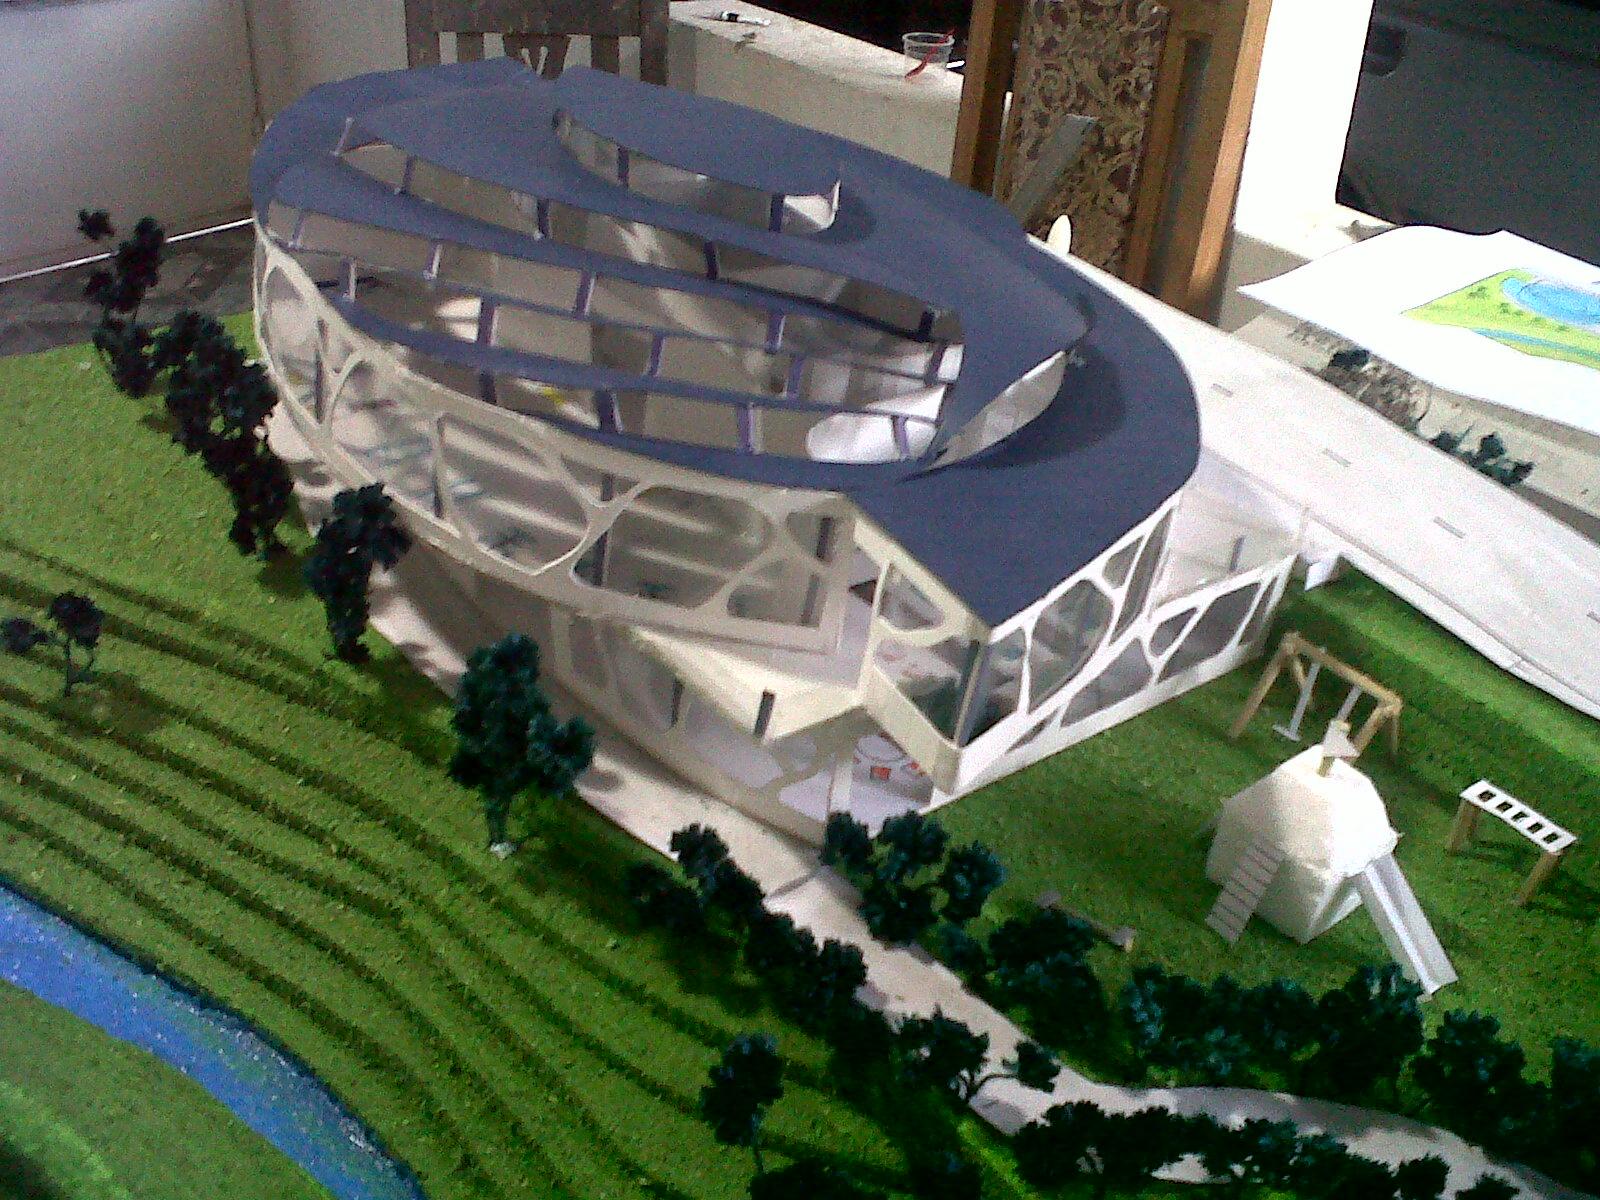 Dise o arquitectonico for Salon de usos multiples programa arquitectonico